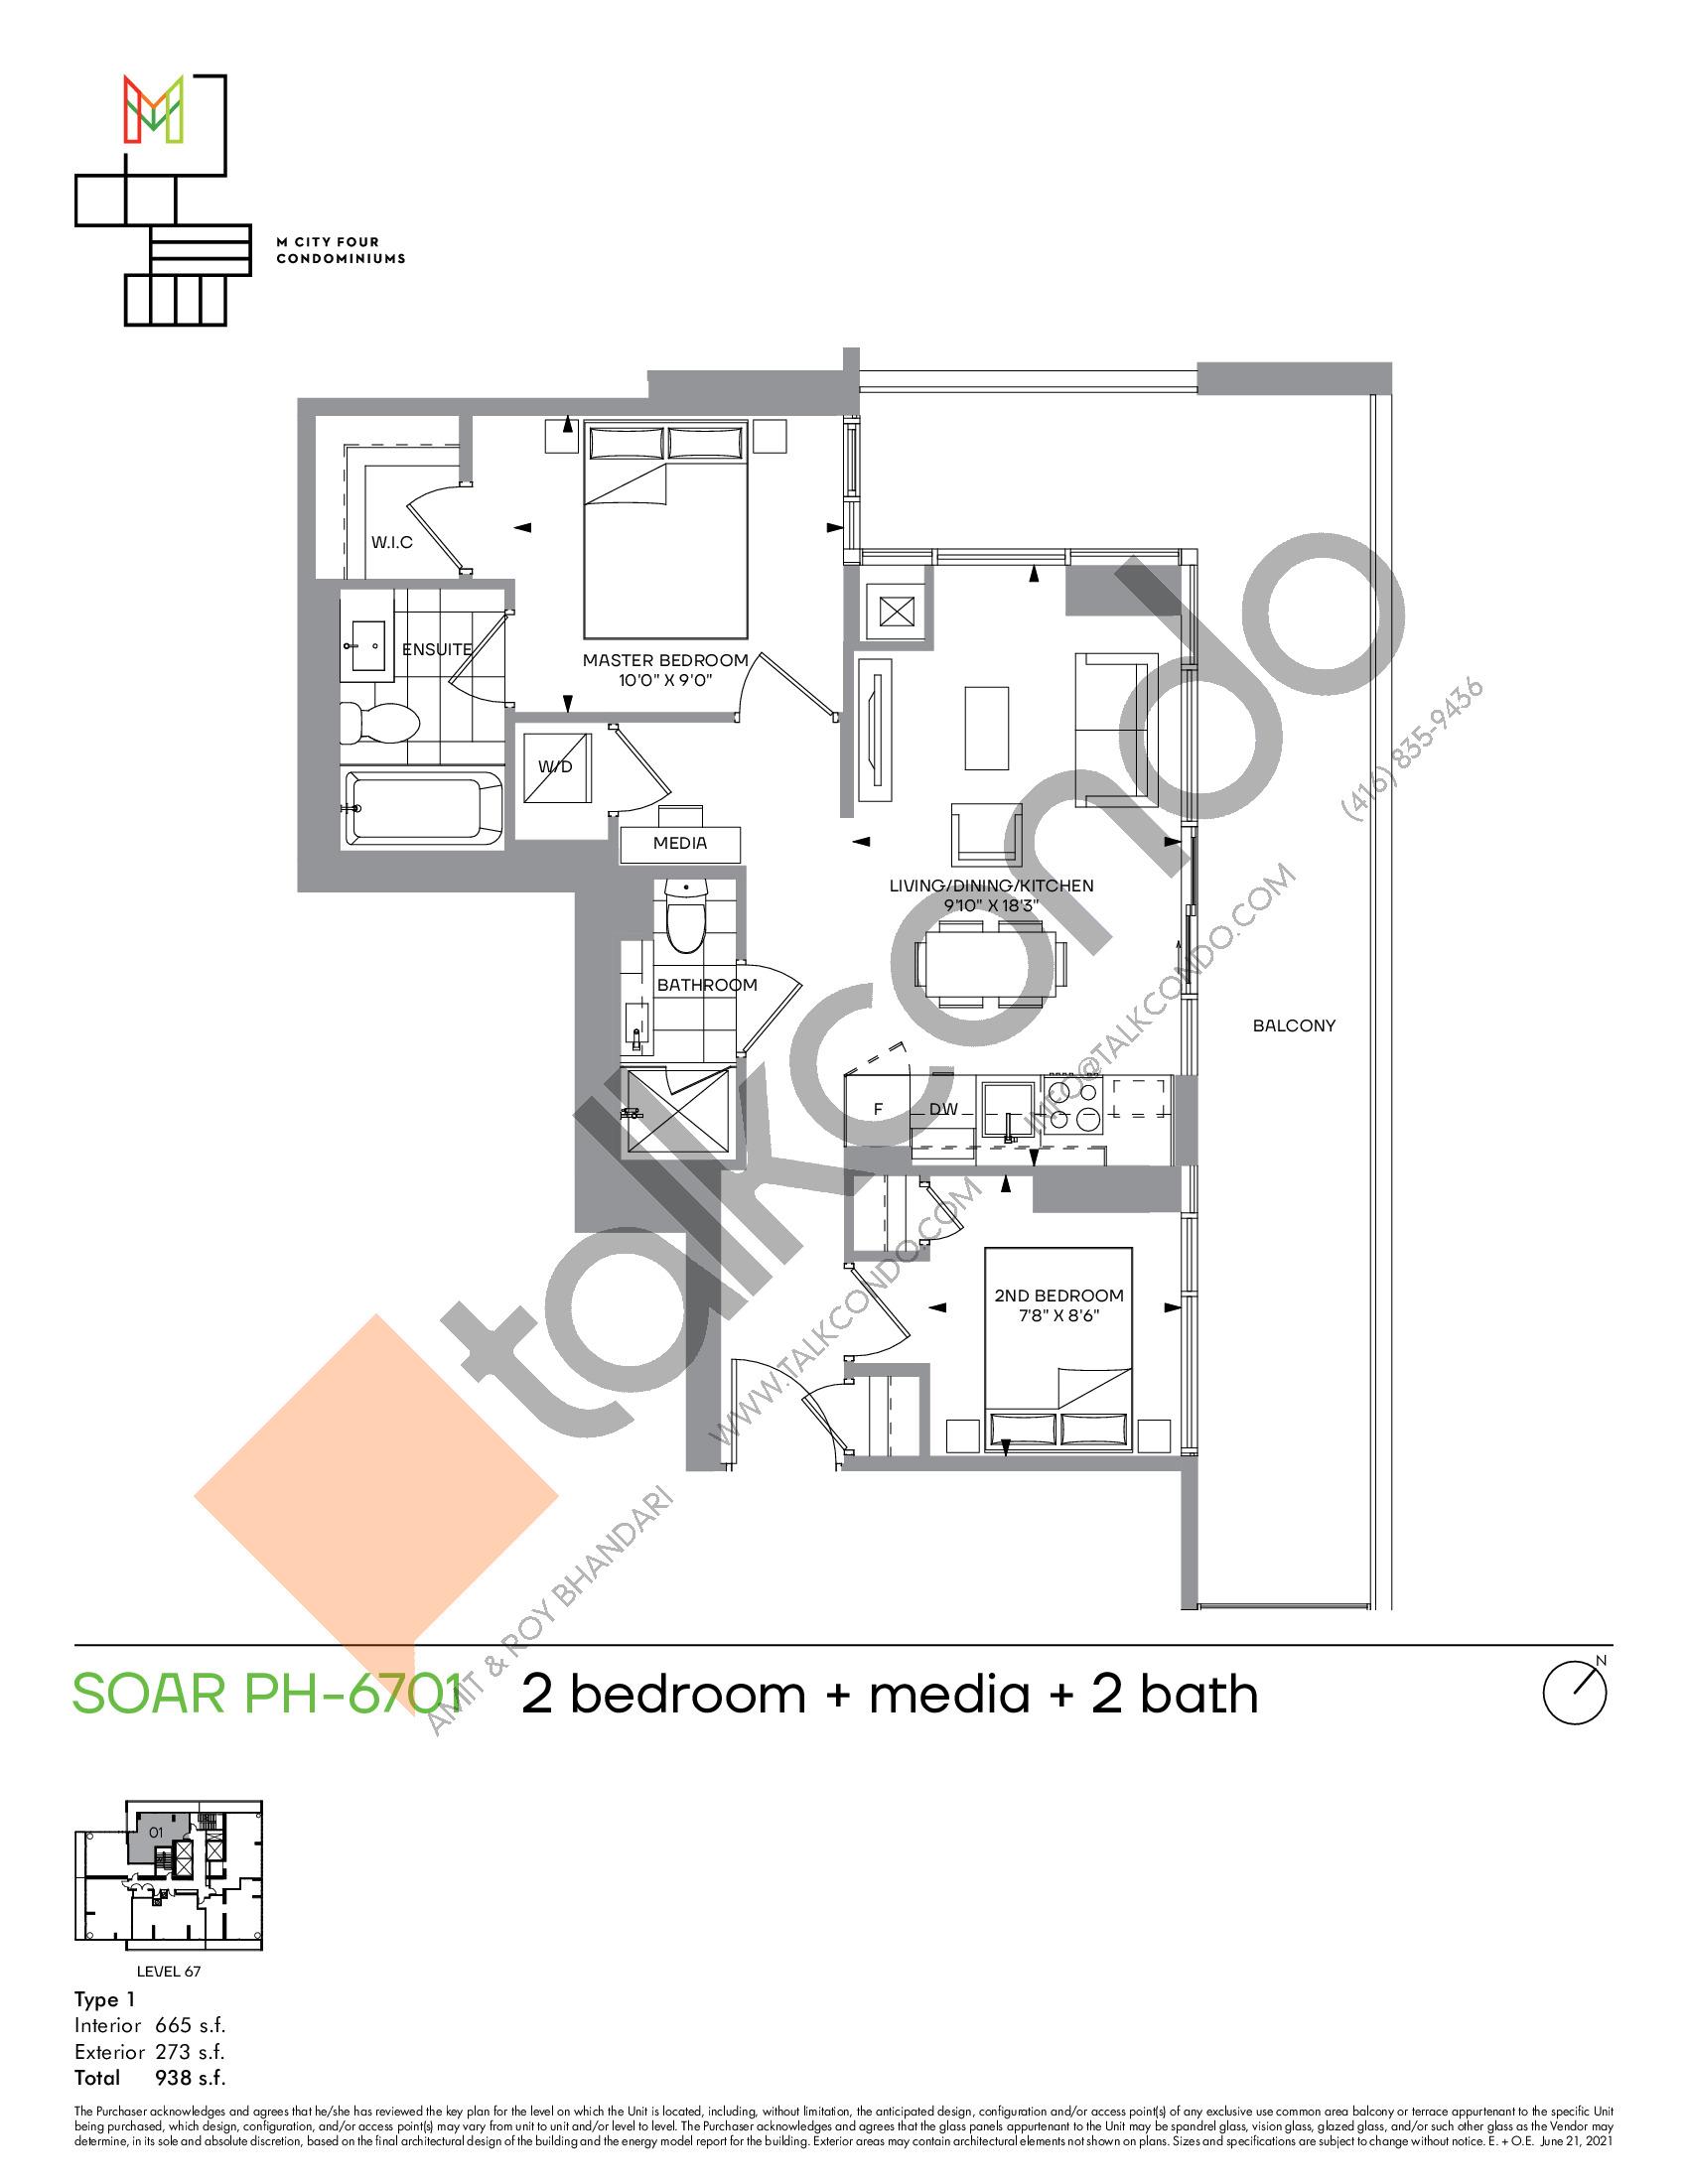 Soar PH-6701 Floor Plan at M4 Condos - 665 sq.ft